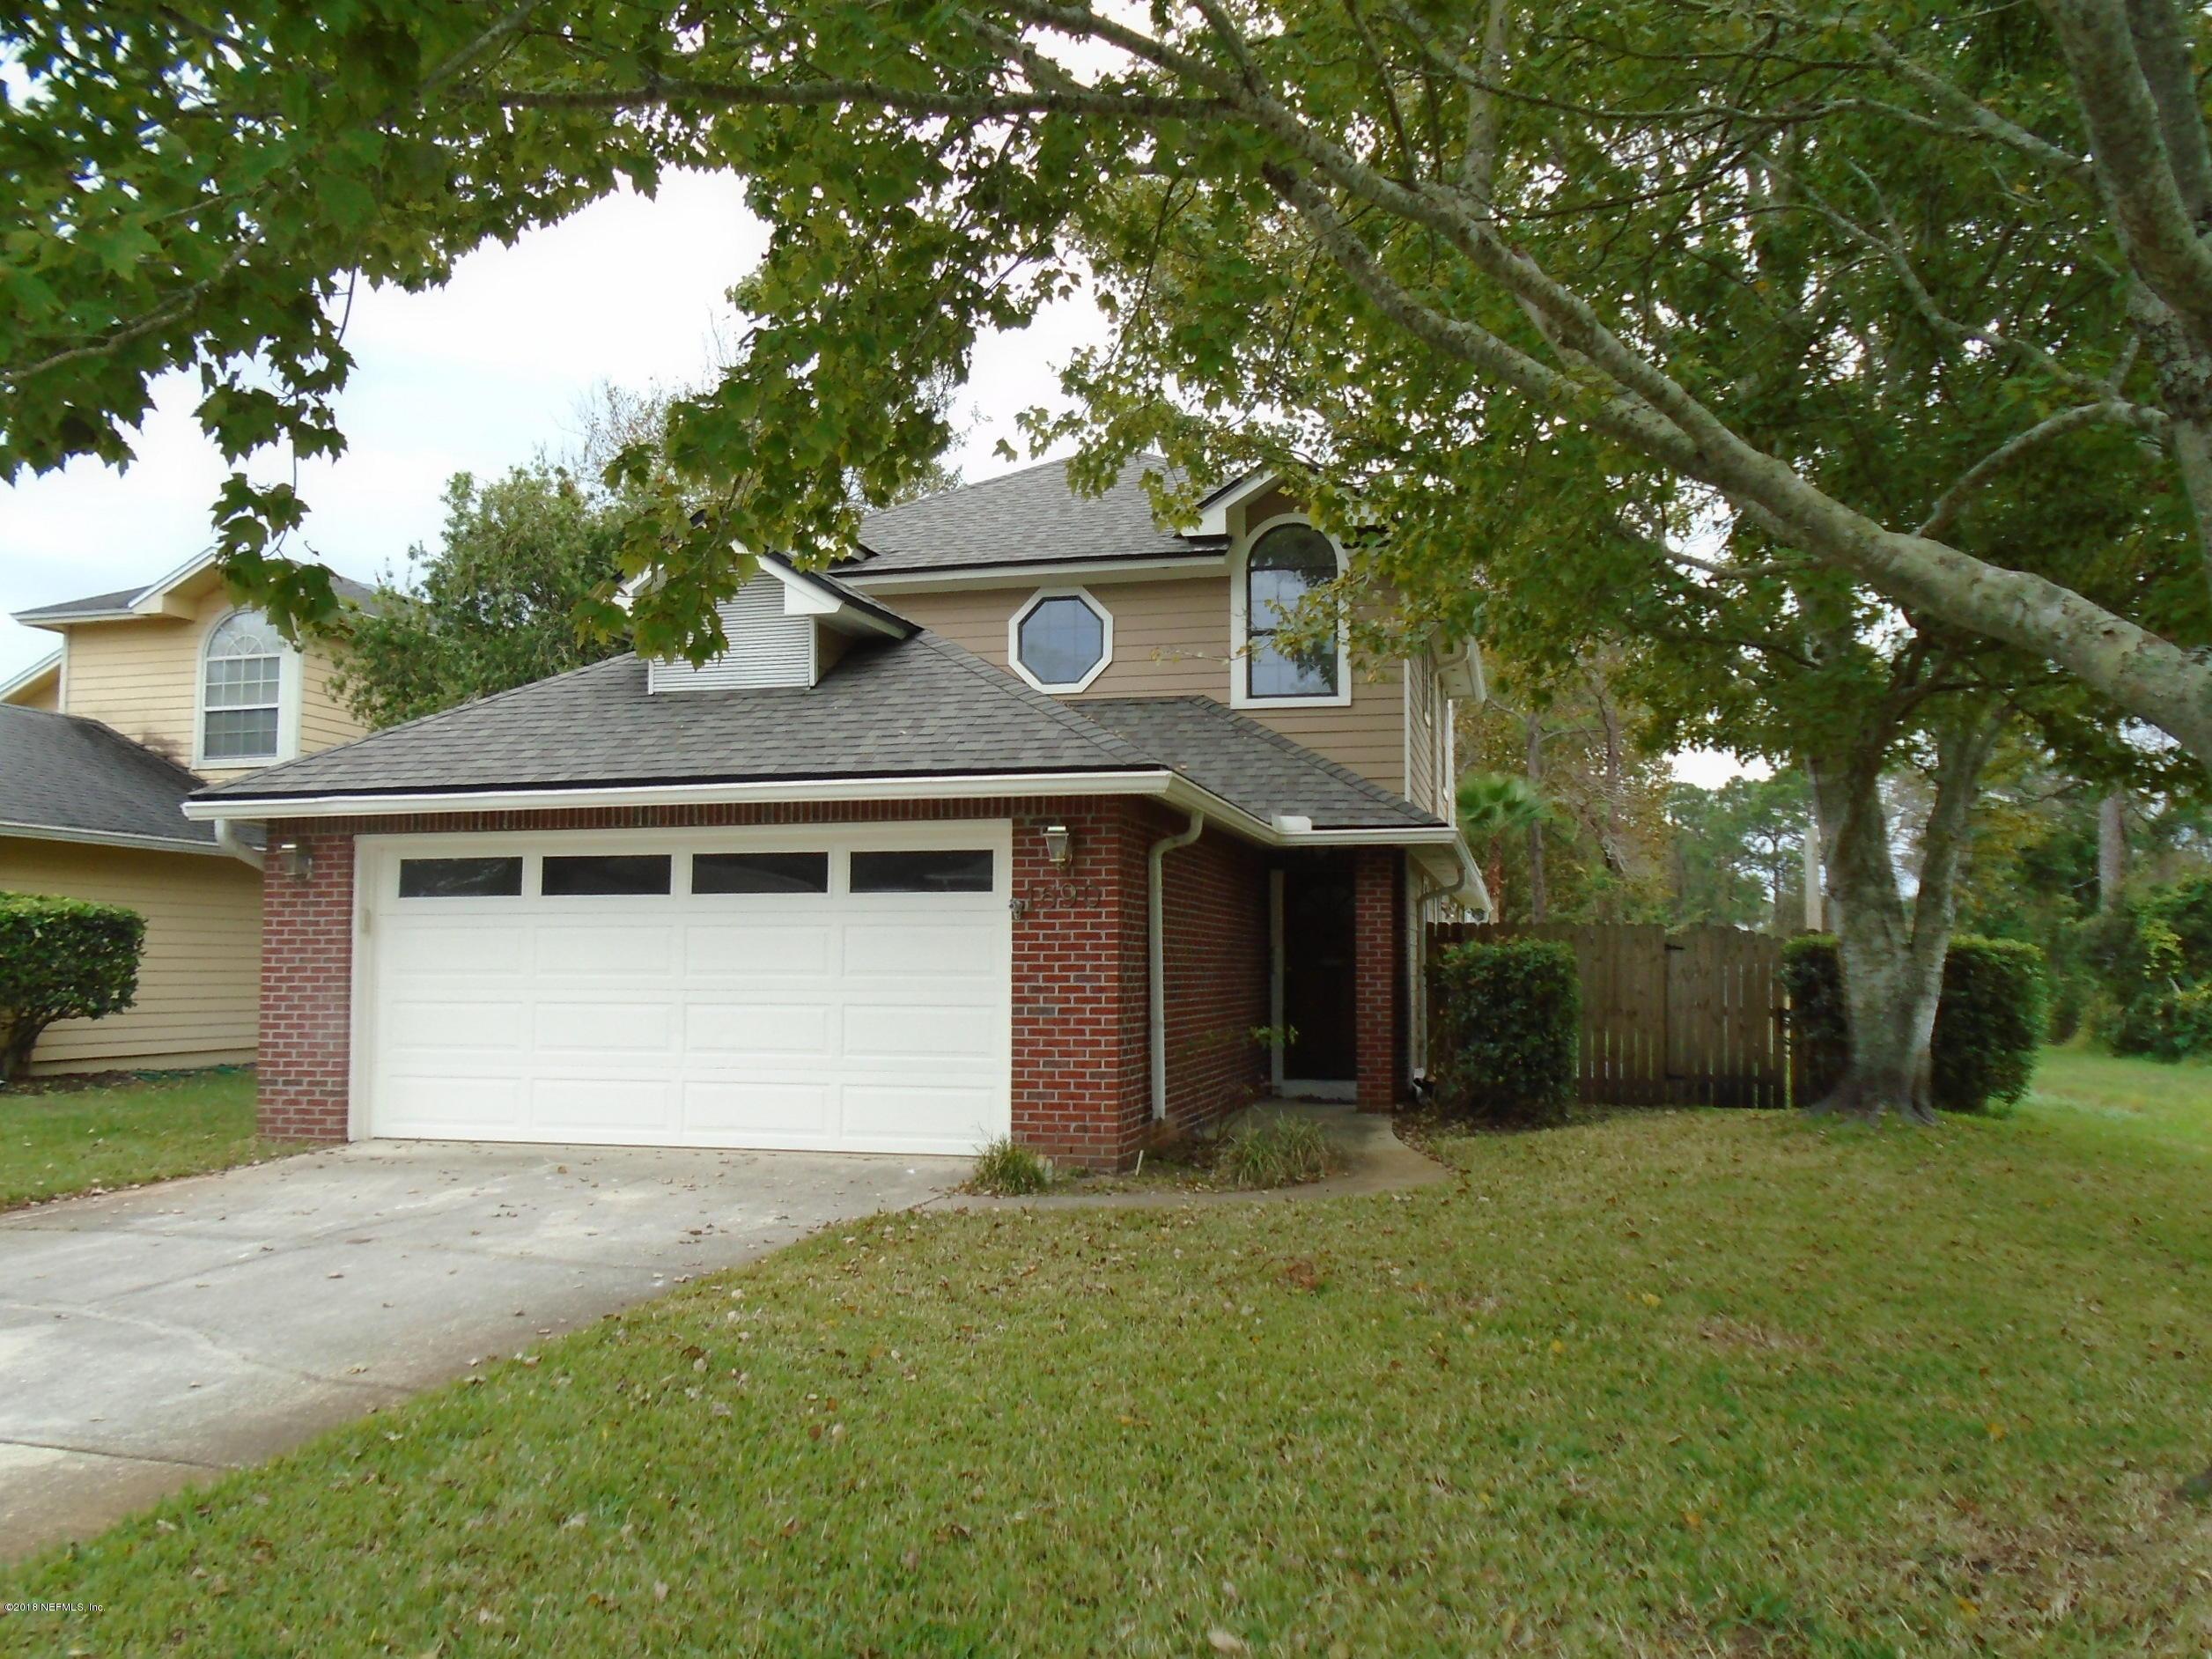 1690 EVANS, JACKSONVILLE BEACH, FLORIDA 32250, 4 Bedrooms Bedrooms, ,2 BathroomsBathrooms,Residential - single family,For sale,EVANS,965327